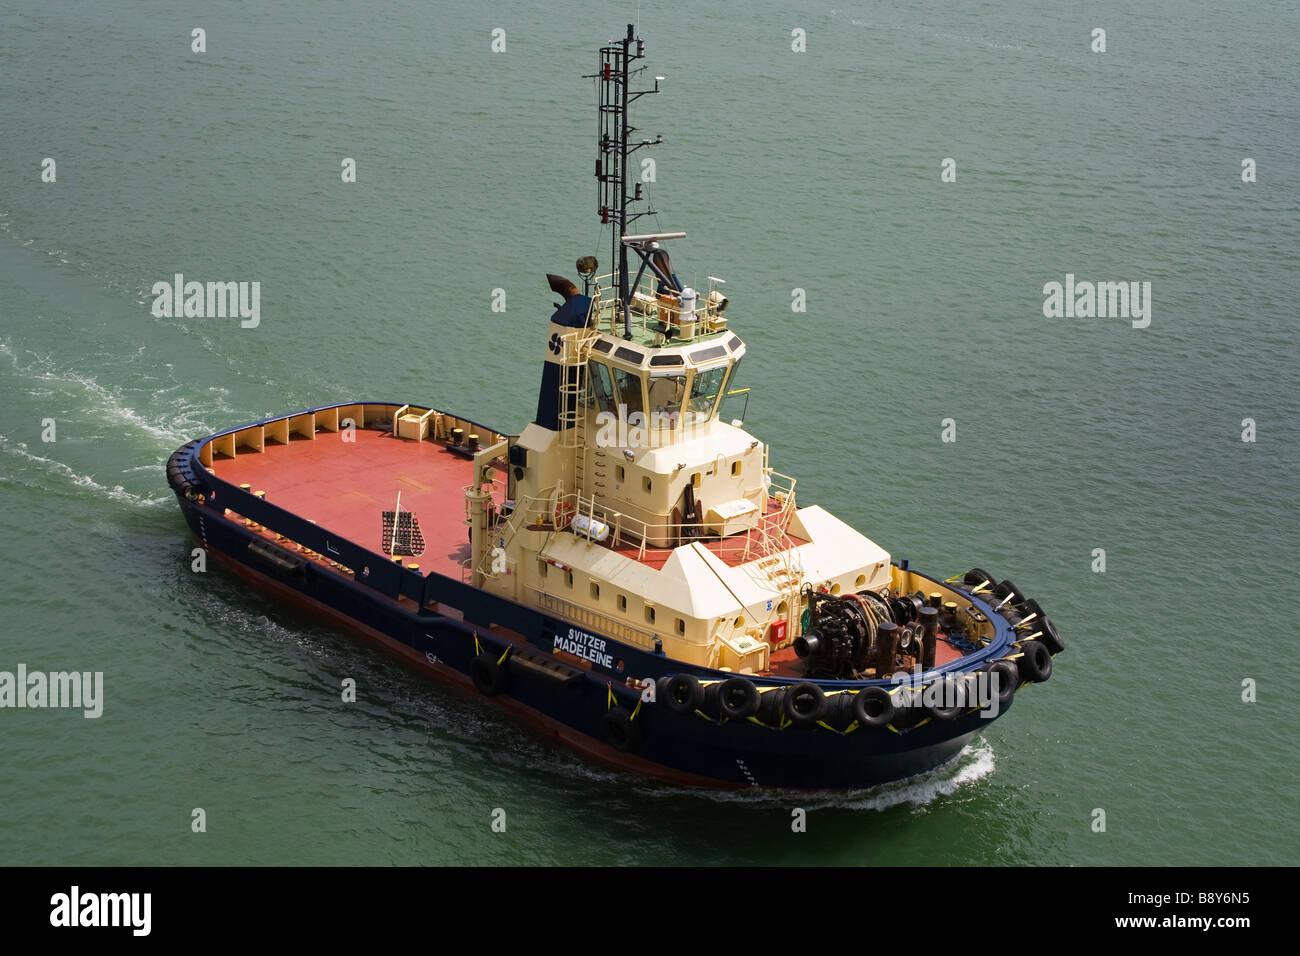 Tug Boat, Port of Southampton, Hampshire County, England, Great Britain - Stock Image